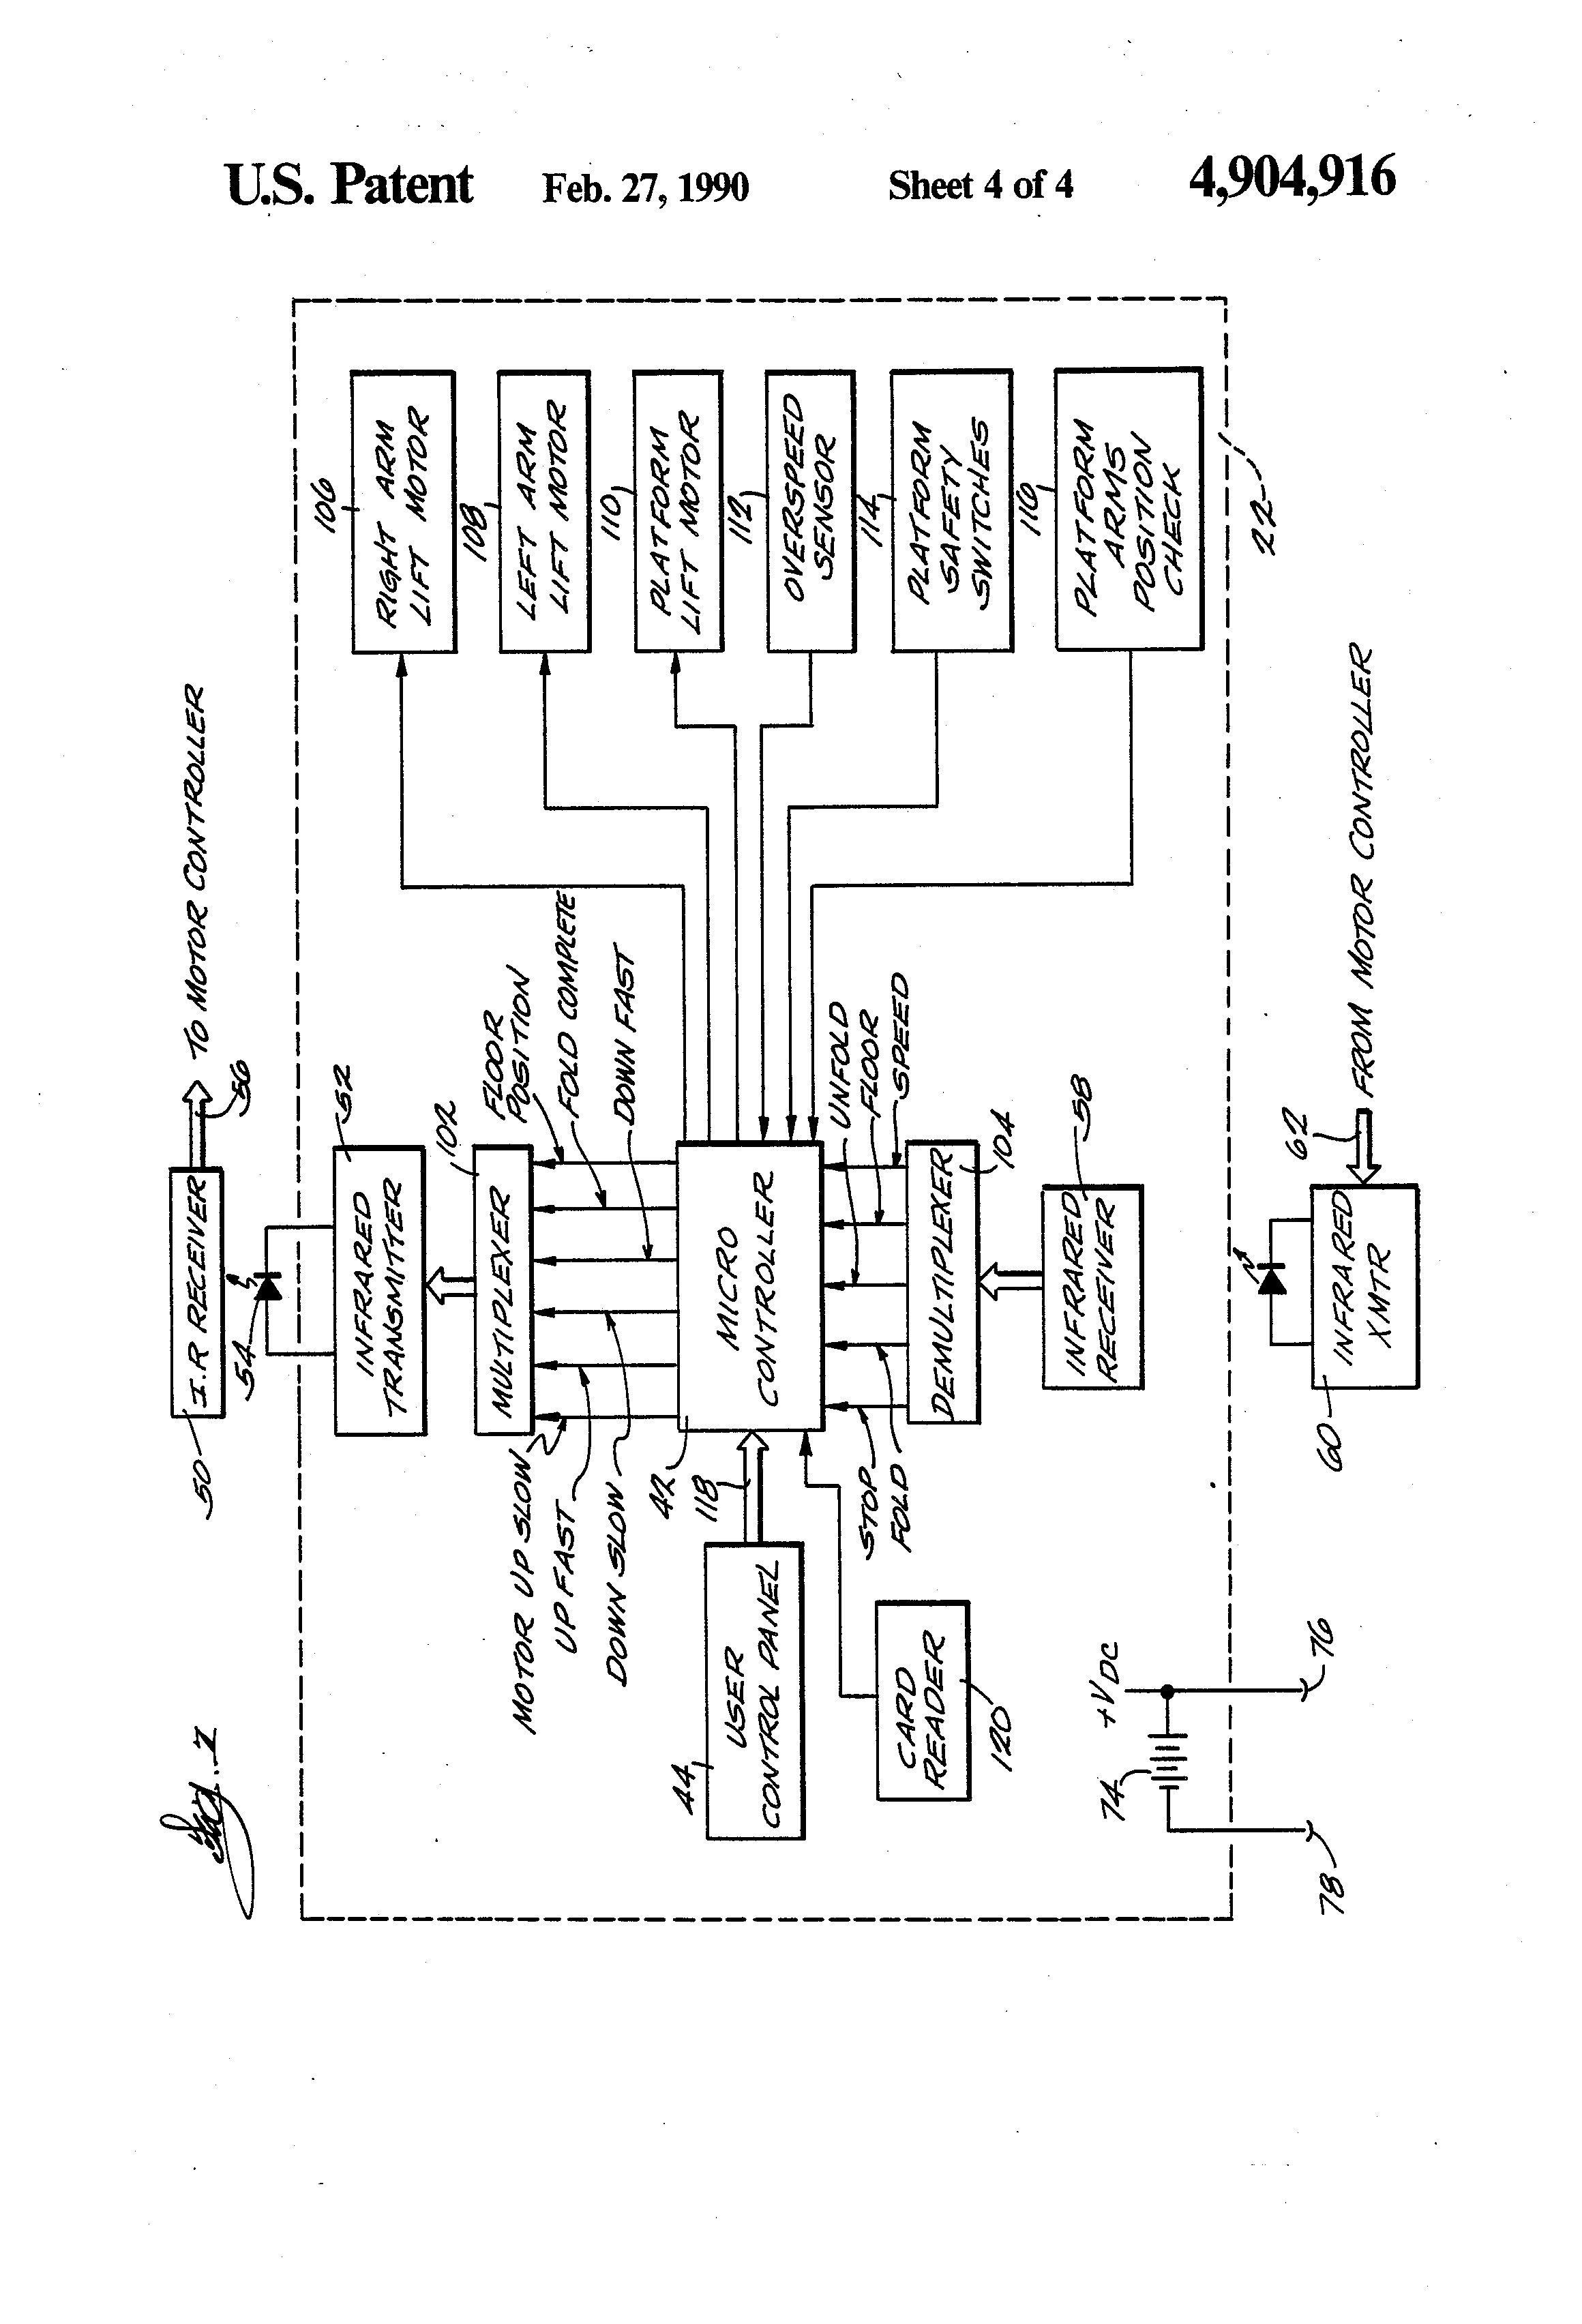 Snorkel Lift Wiring Diagram Unique In 2020 Diagram Scissor Lift Electrical Wiring Diagram